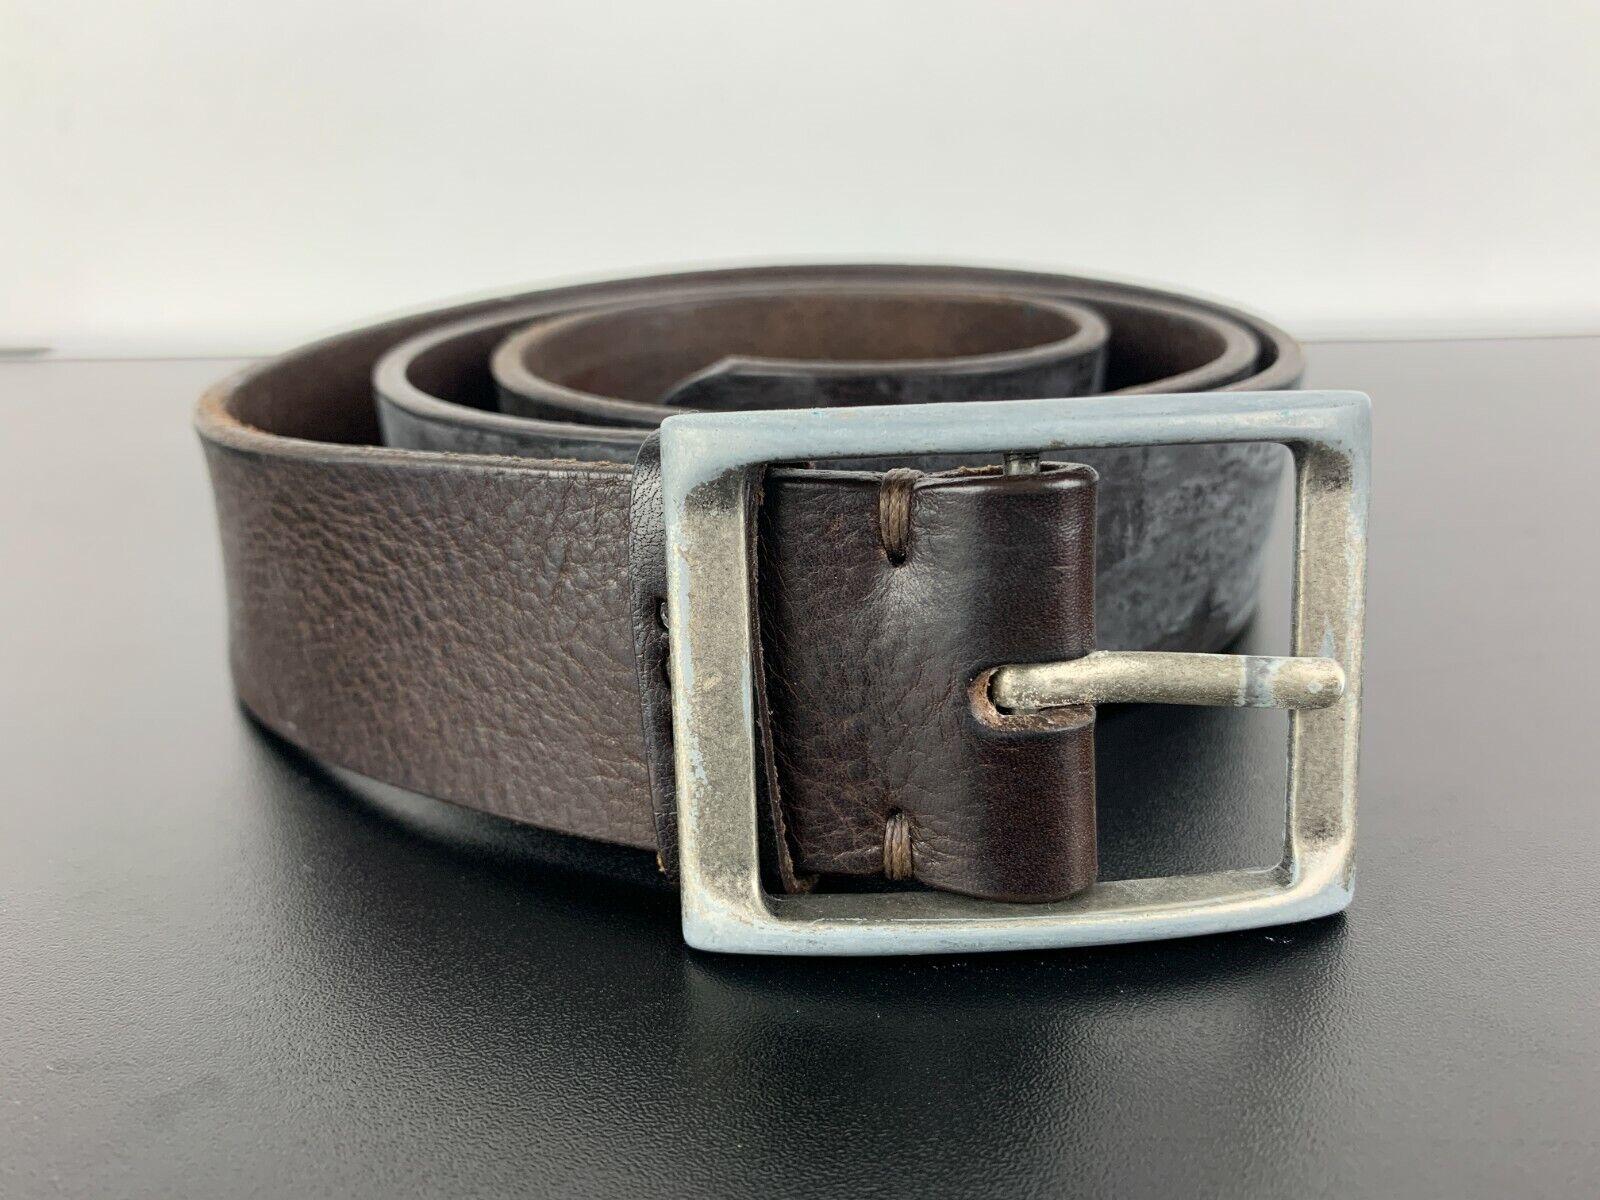 JOOP! Made in Austria Vintage Ledergürtel Genuine Leather Belt Braun Brown 105